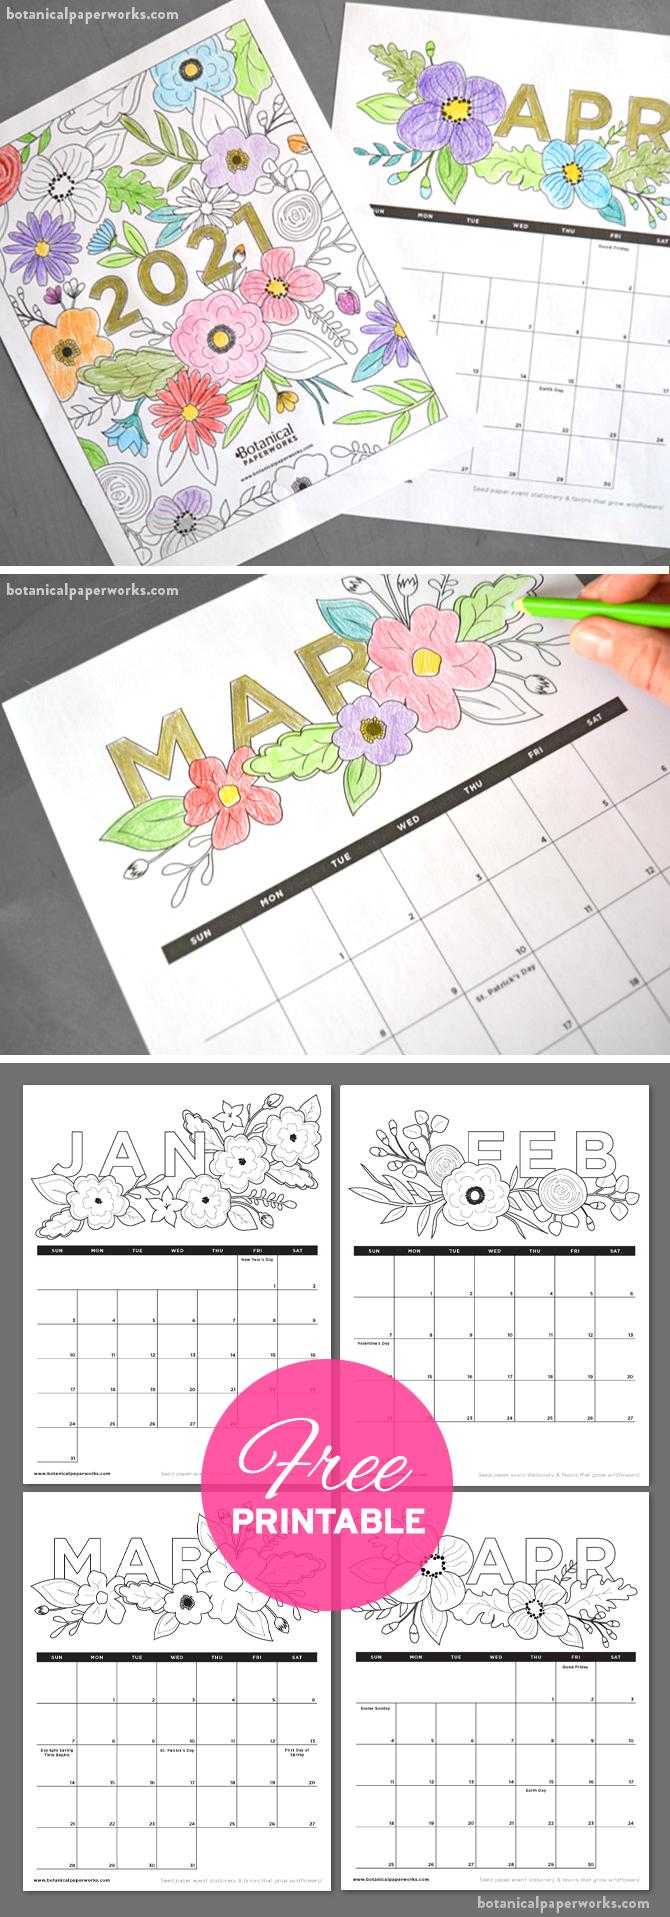 Free Printable 2021 Calendars   Botanical Paperworks